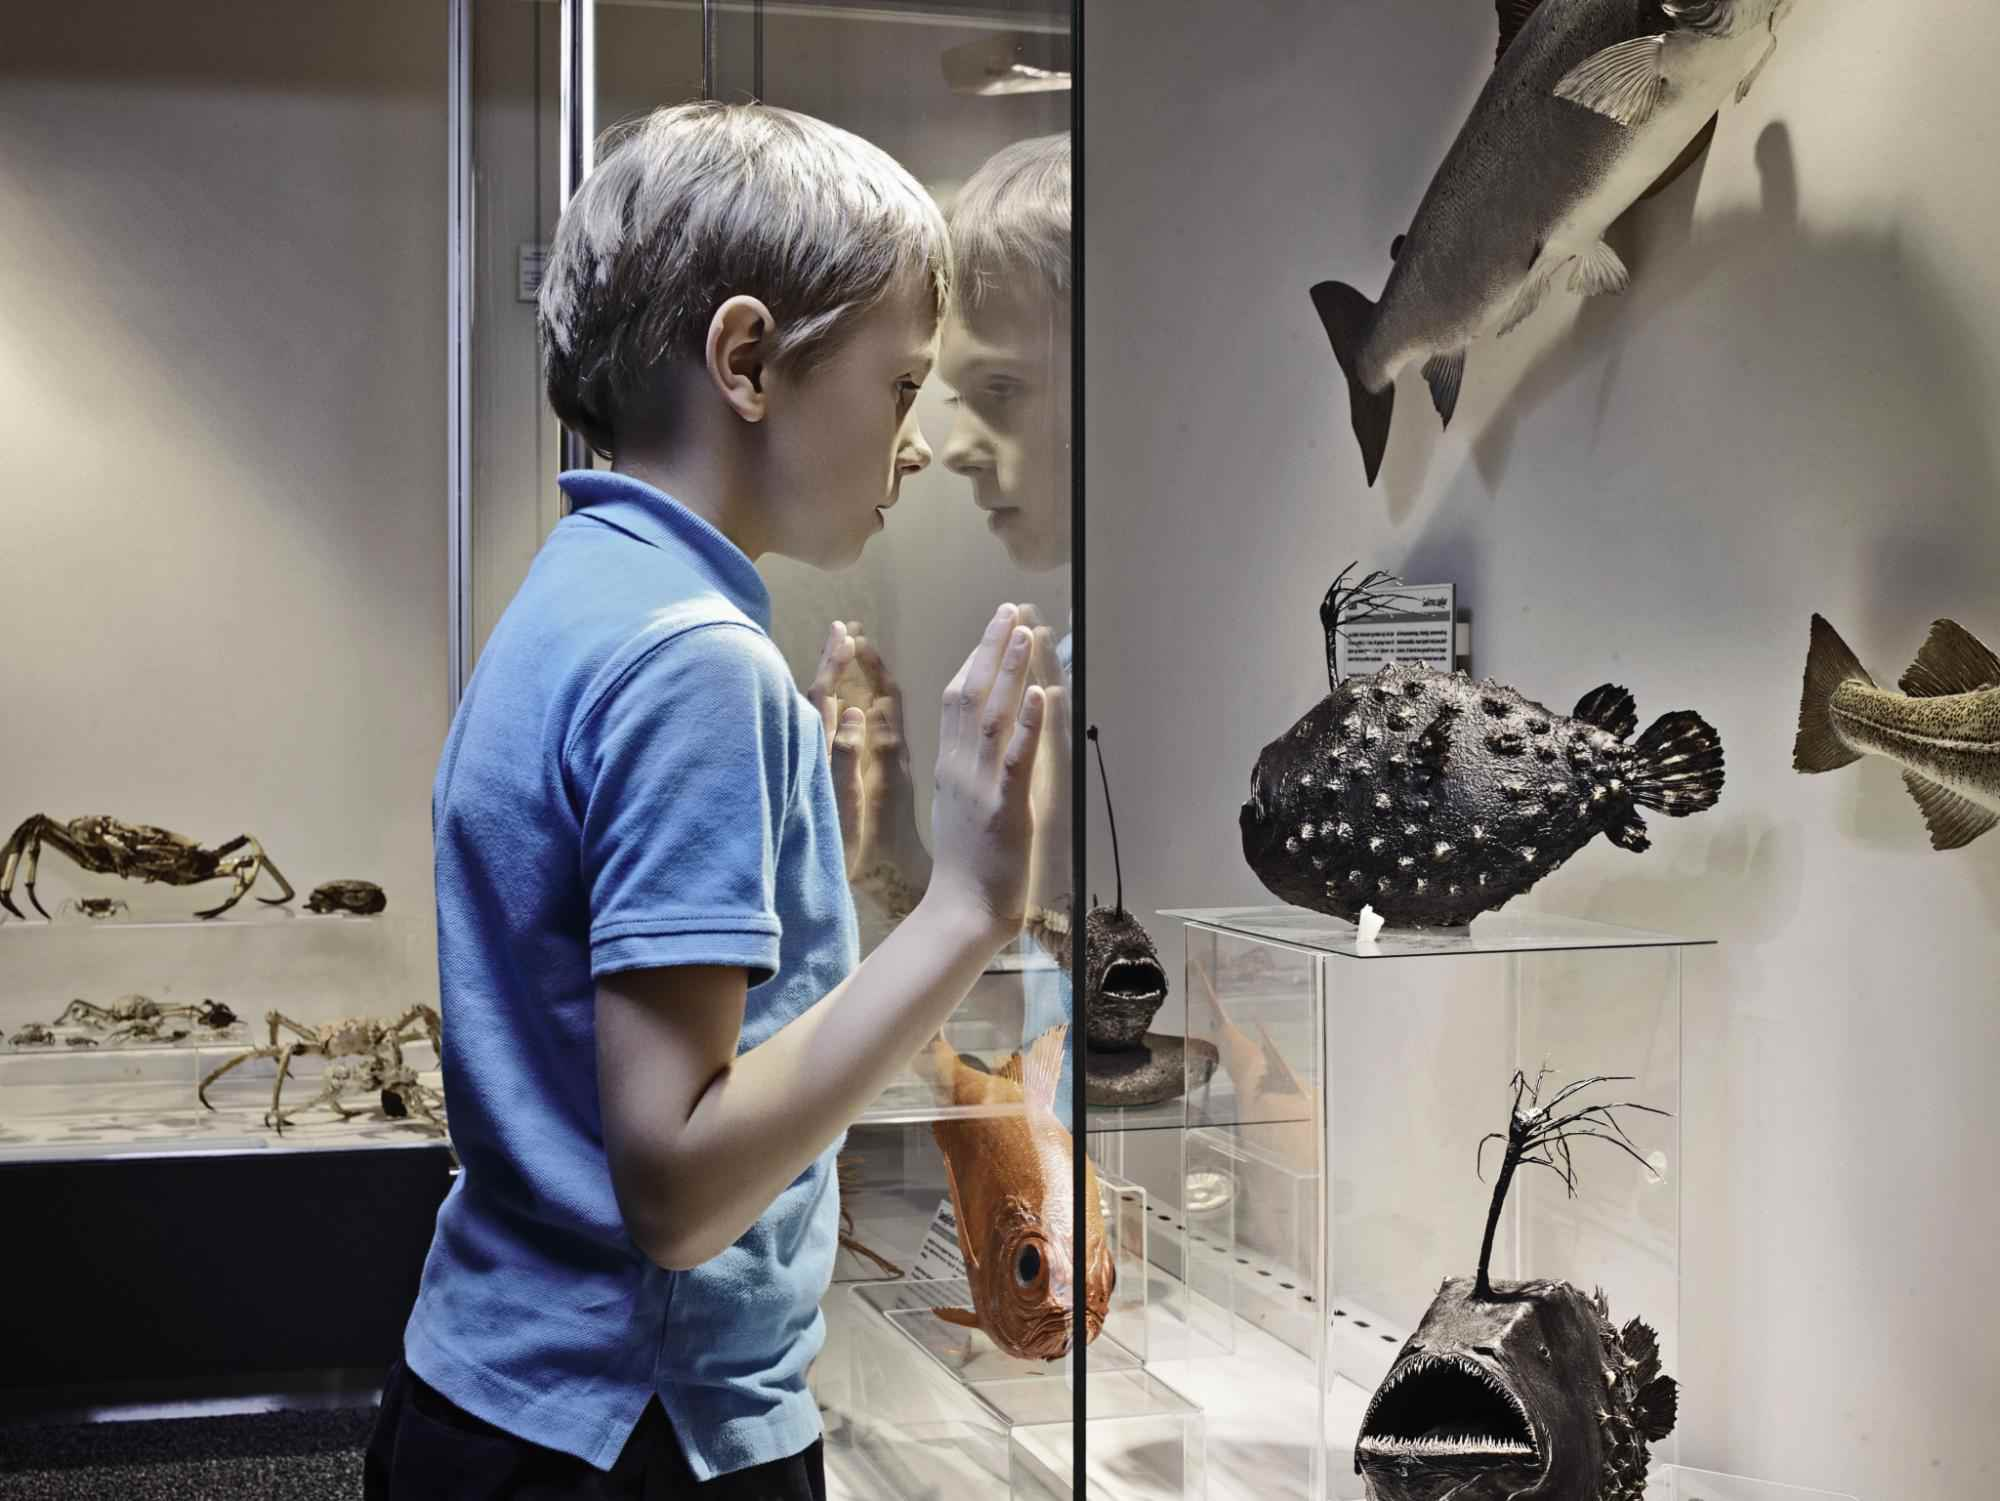 Boy admiring fish models behind glass.